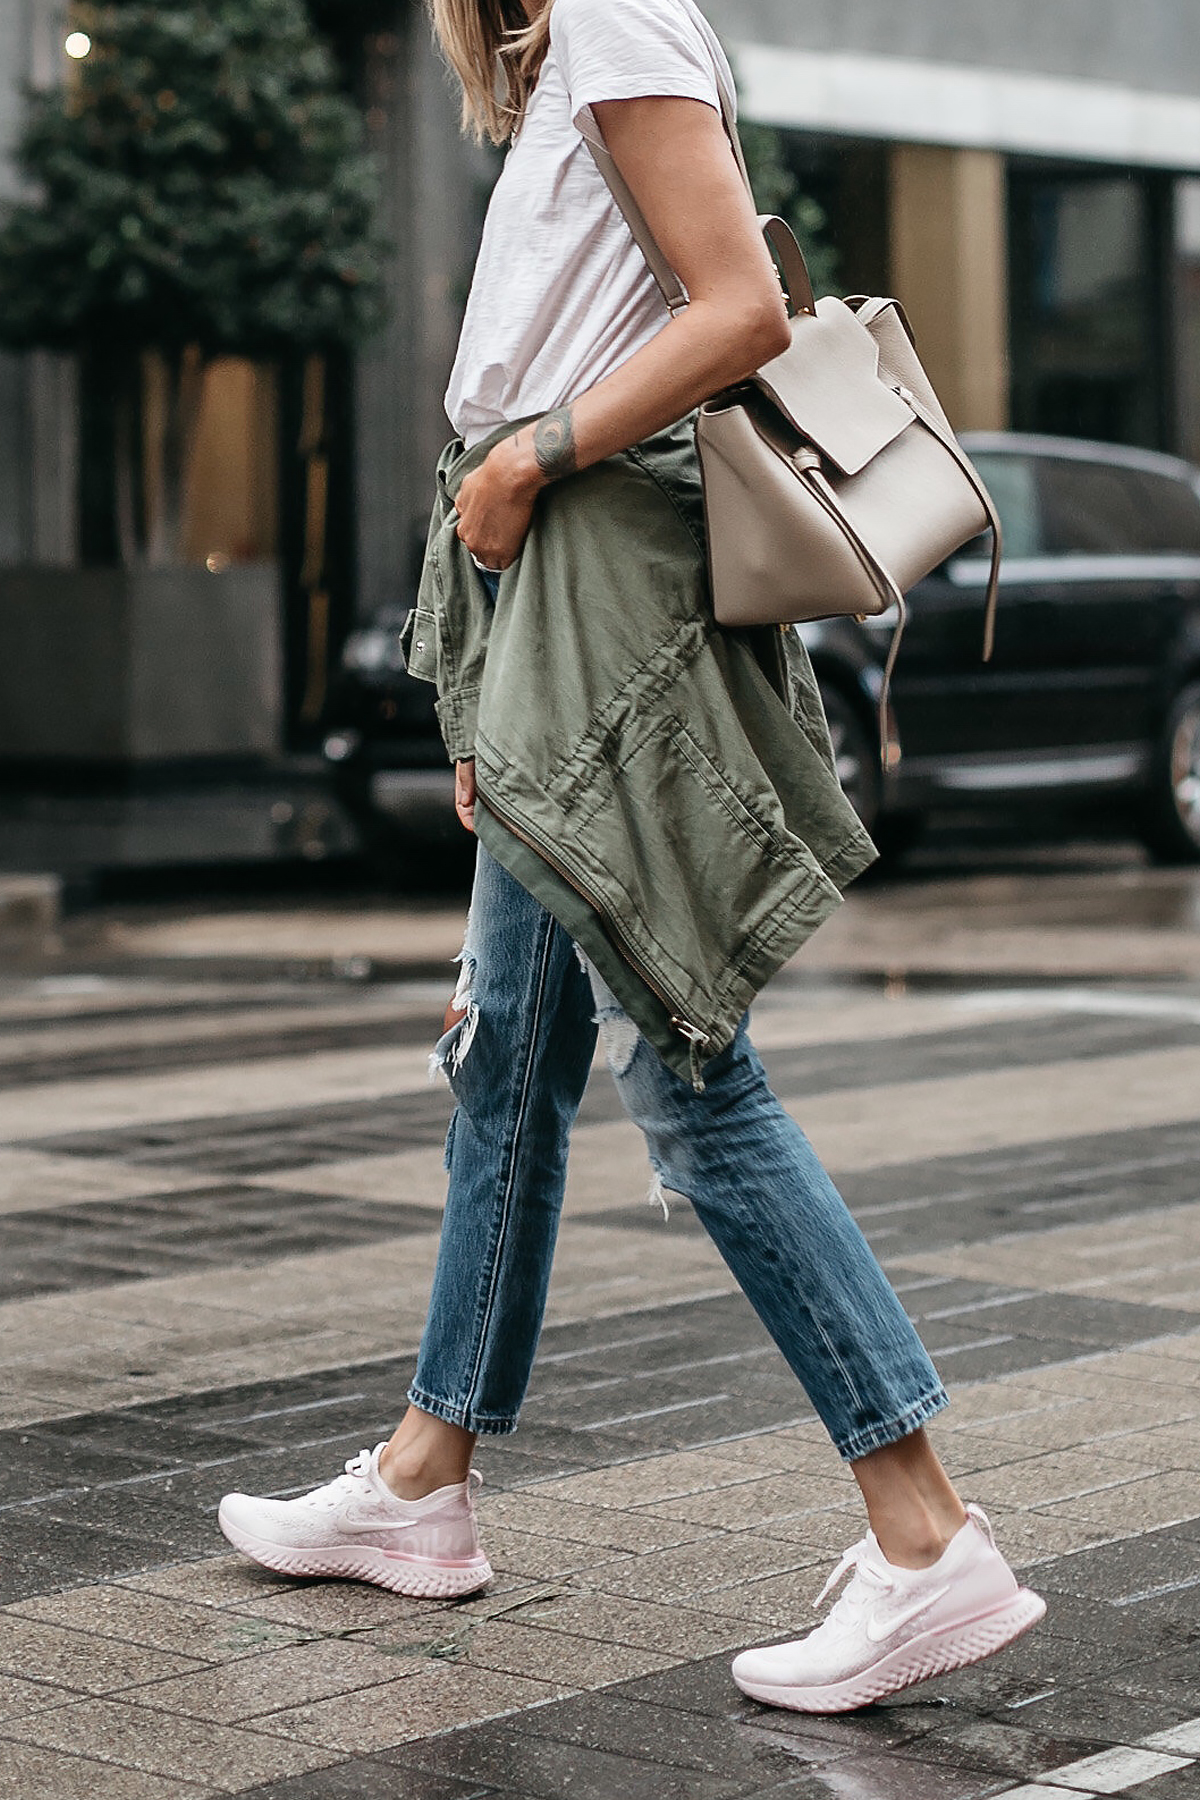 new arrival 9c84d 2bdf7 Woman Wearing Nike React Running Shoe White Tshirt Ripped Denim Jeans Green  Utility Jacket Celine Mini